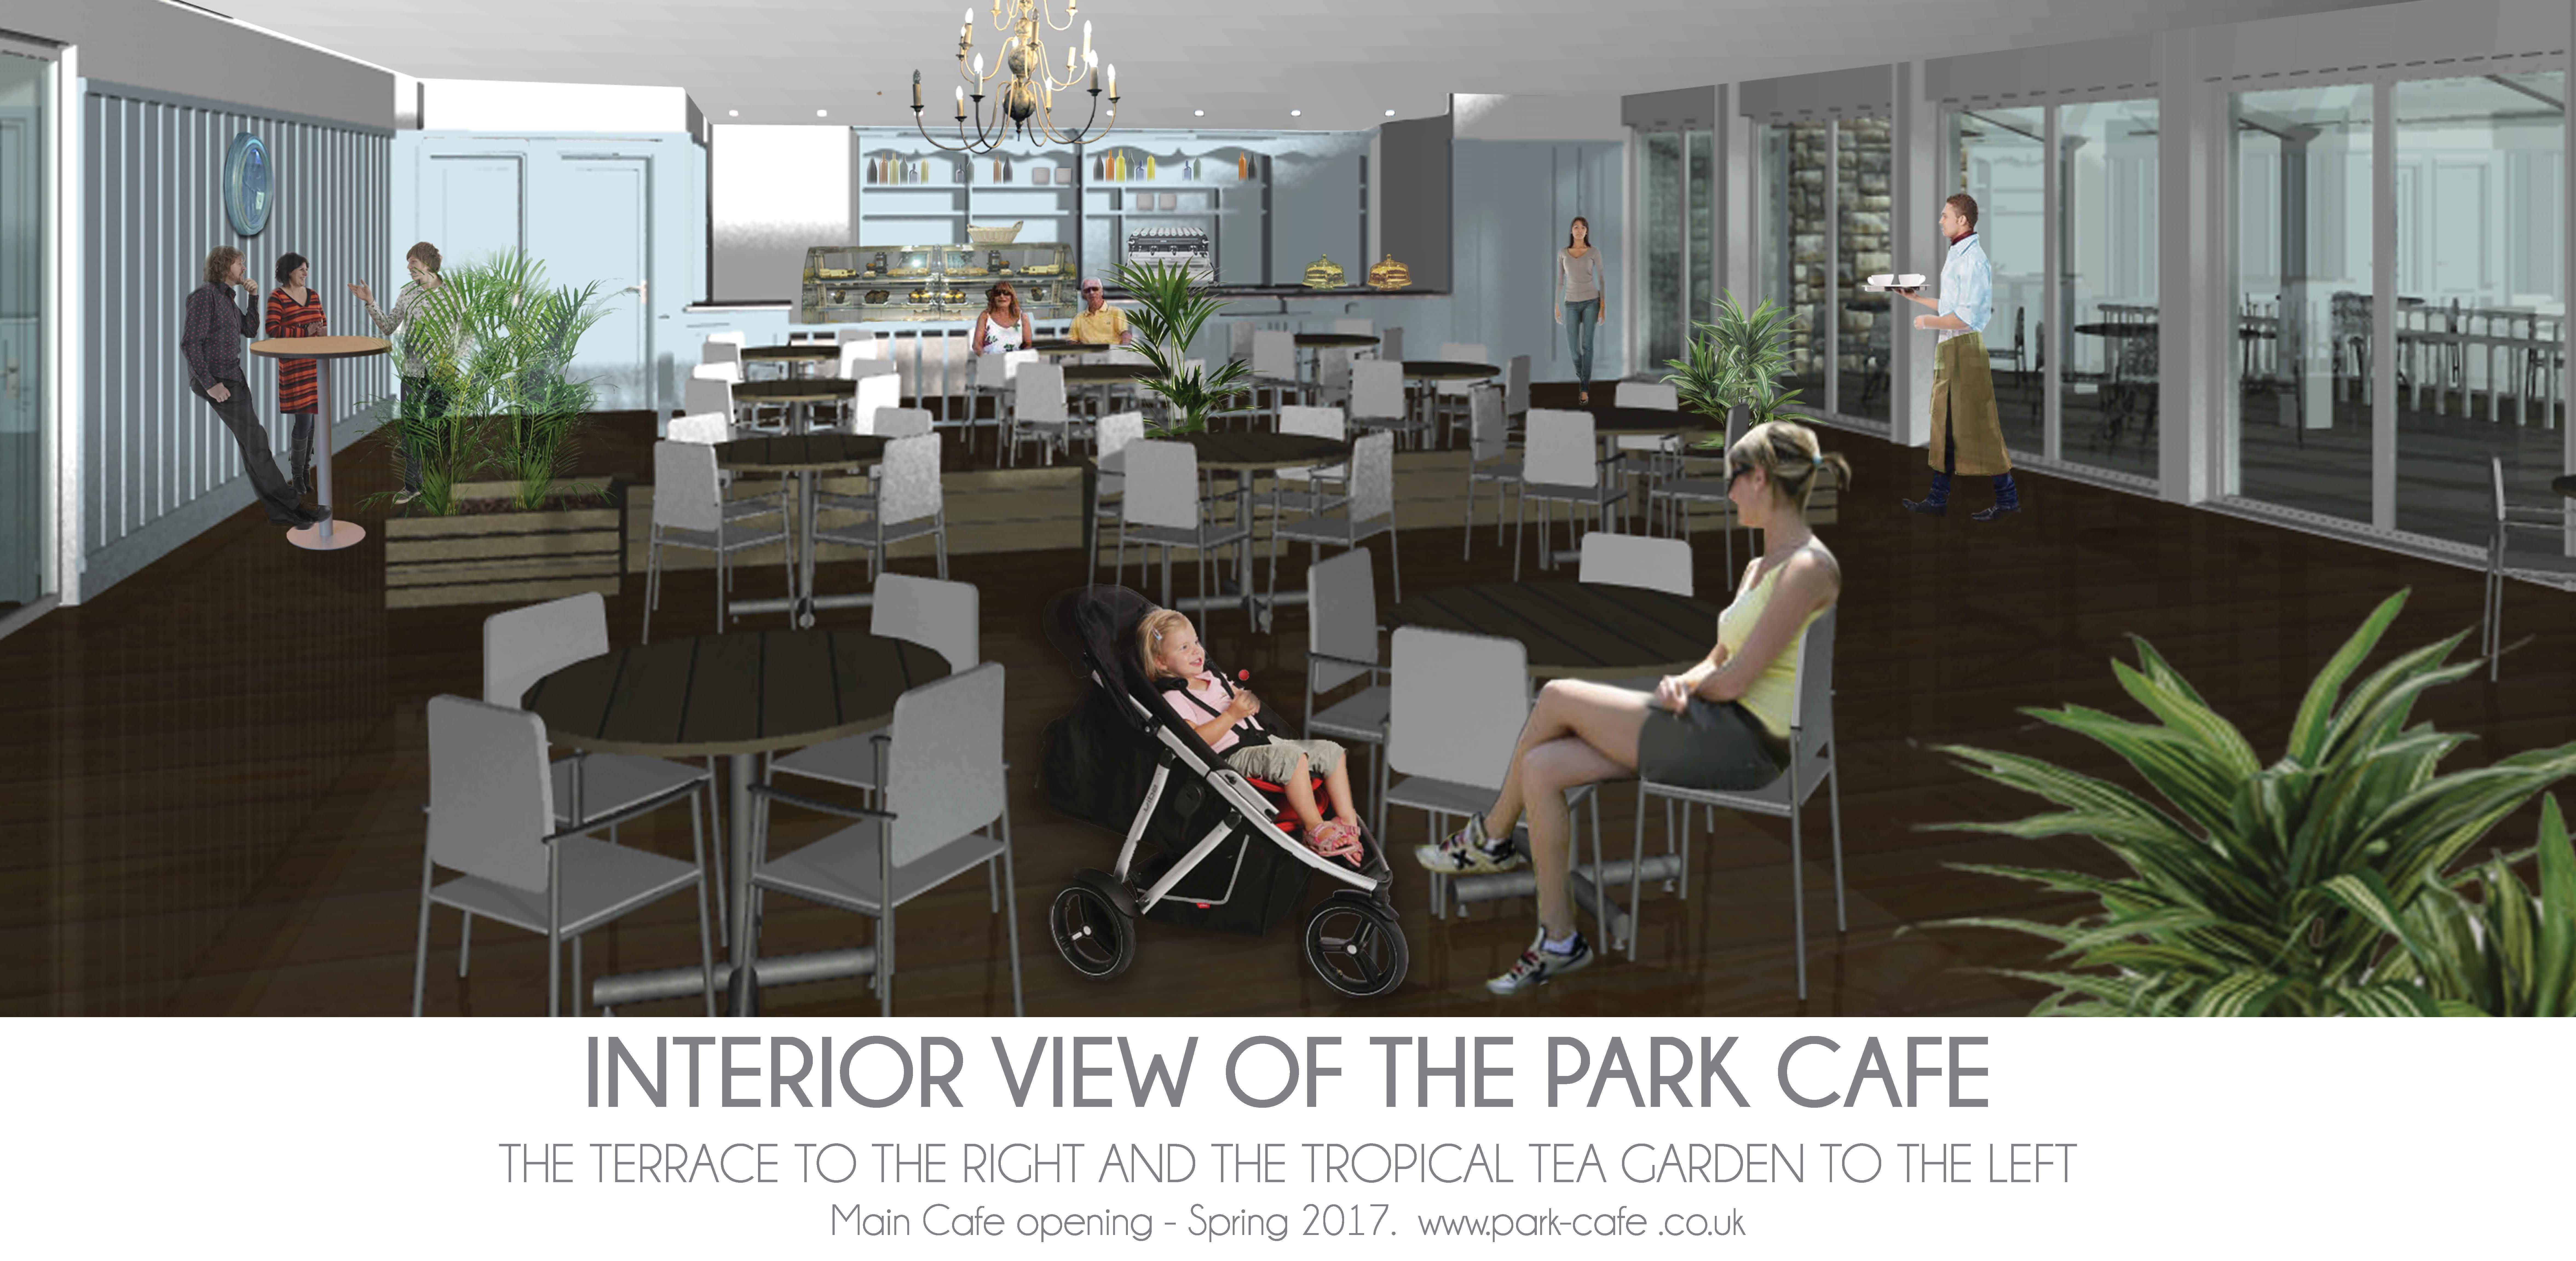 duthie park café to re open in spring